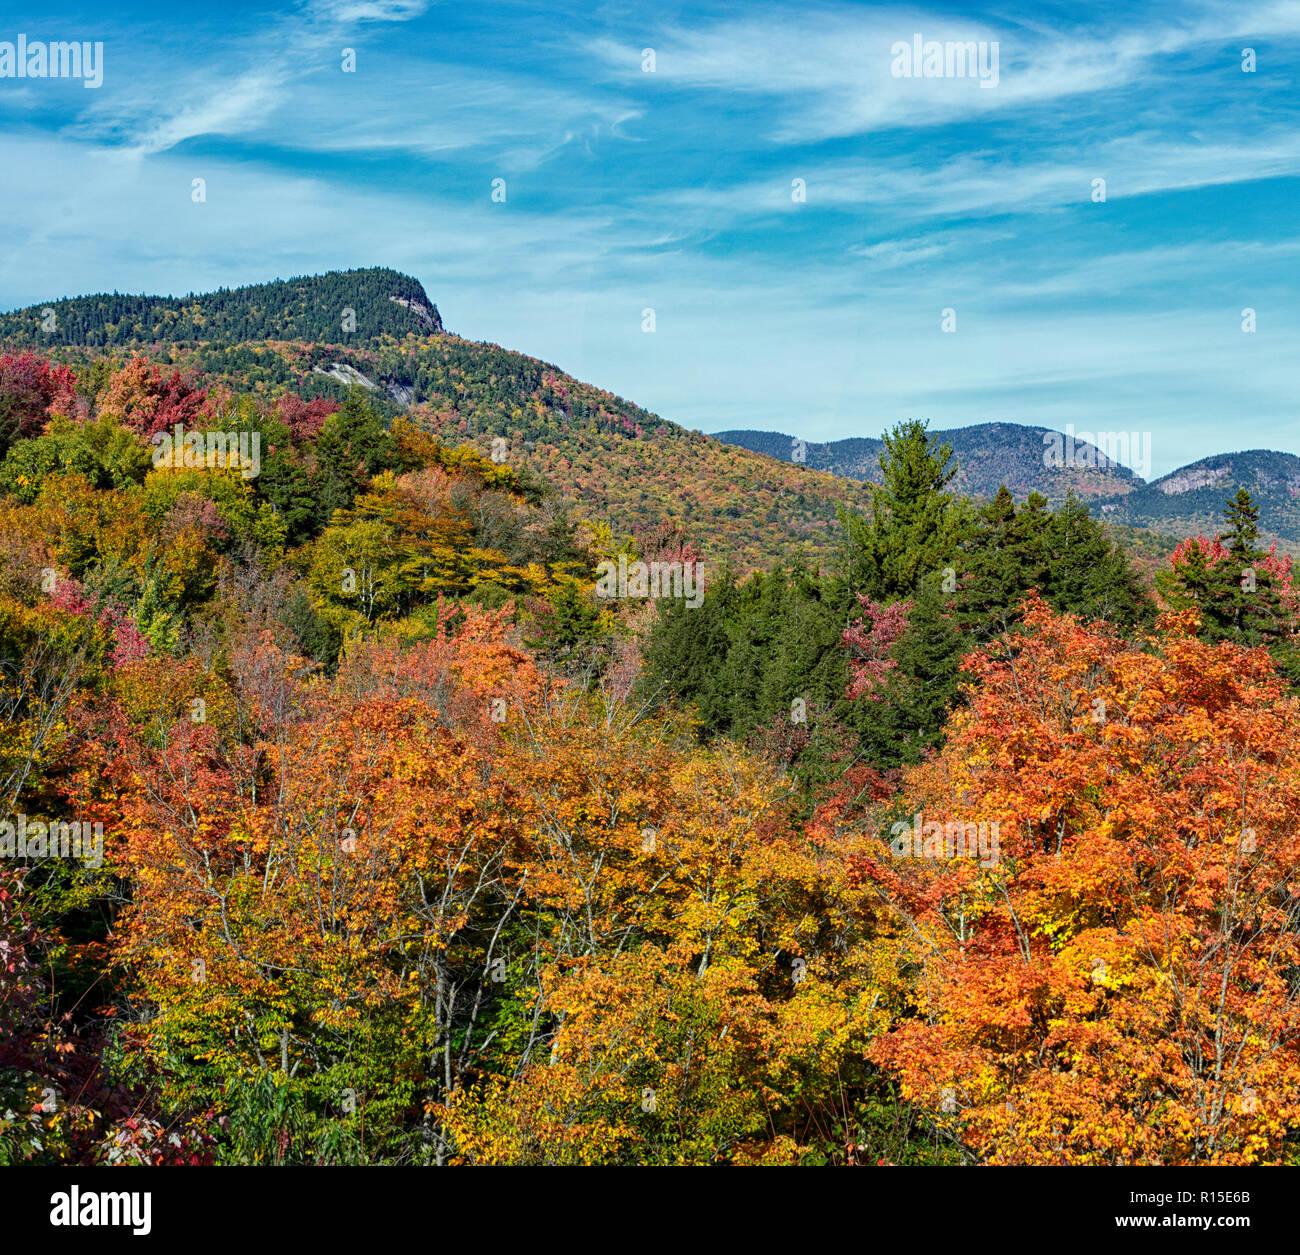 Autumn In The White Mountains Of New Hampshire Stock Photo